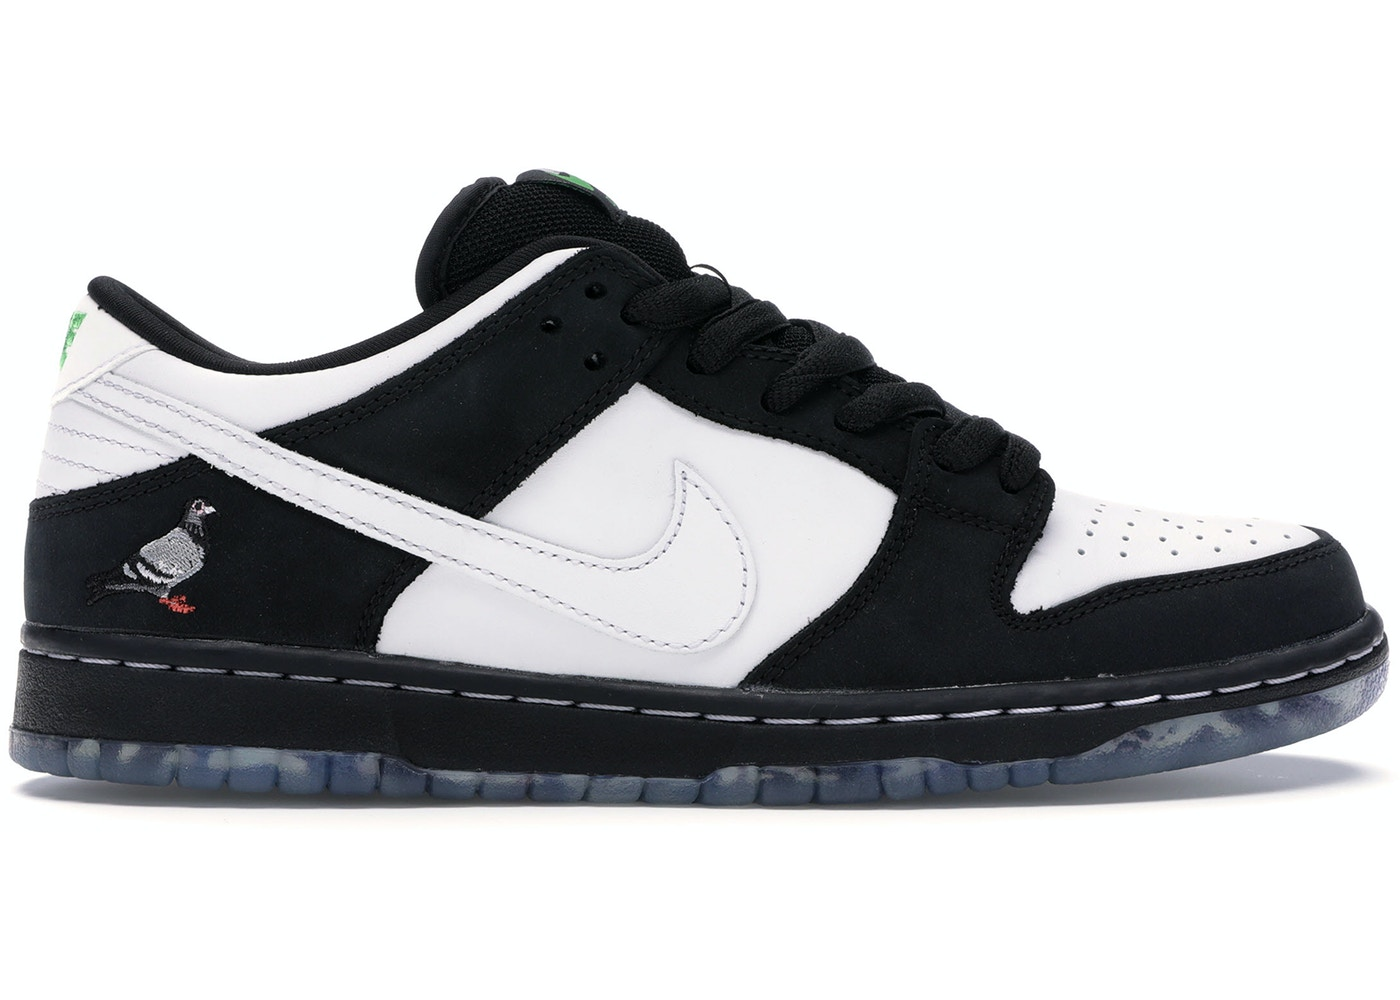 03408698e5e1 Buy Nike SB Shoes   Deadstock Sneakers